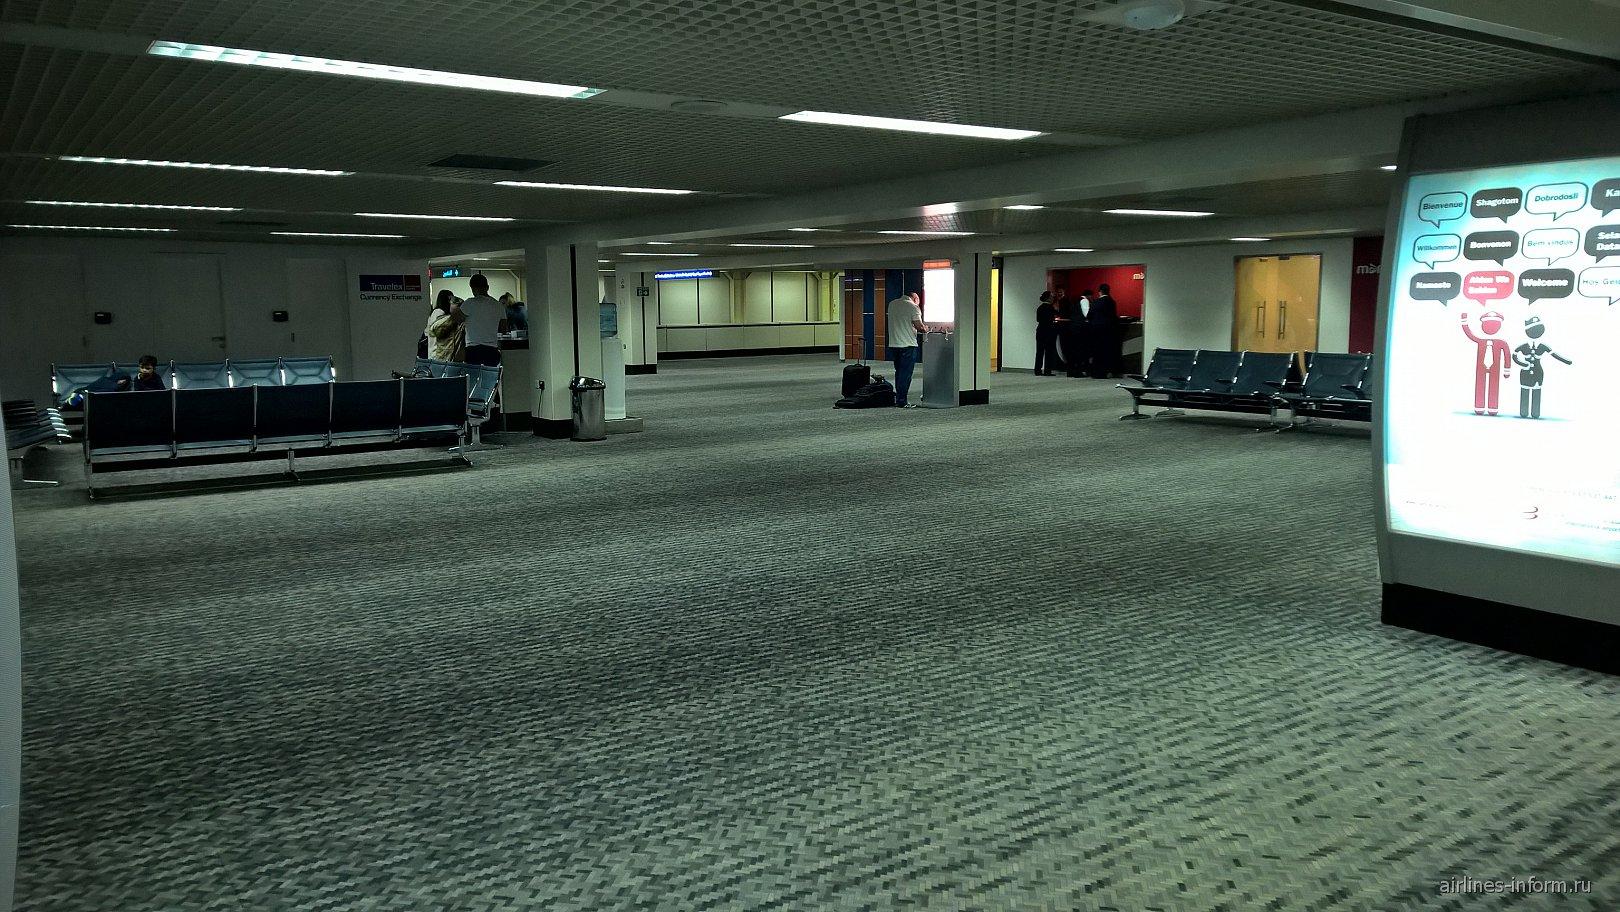 Зона прилета в аэропорту Бахрейн